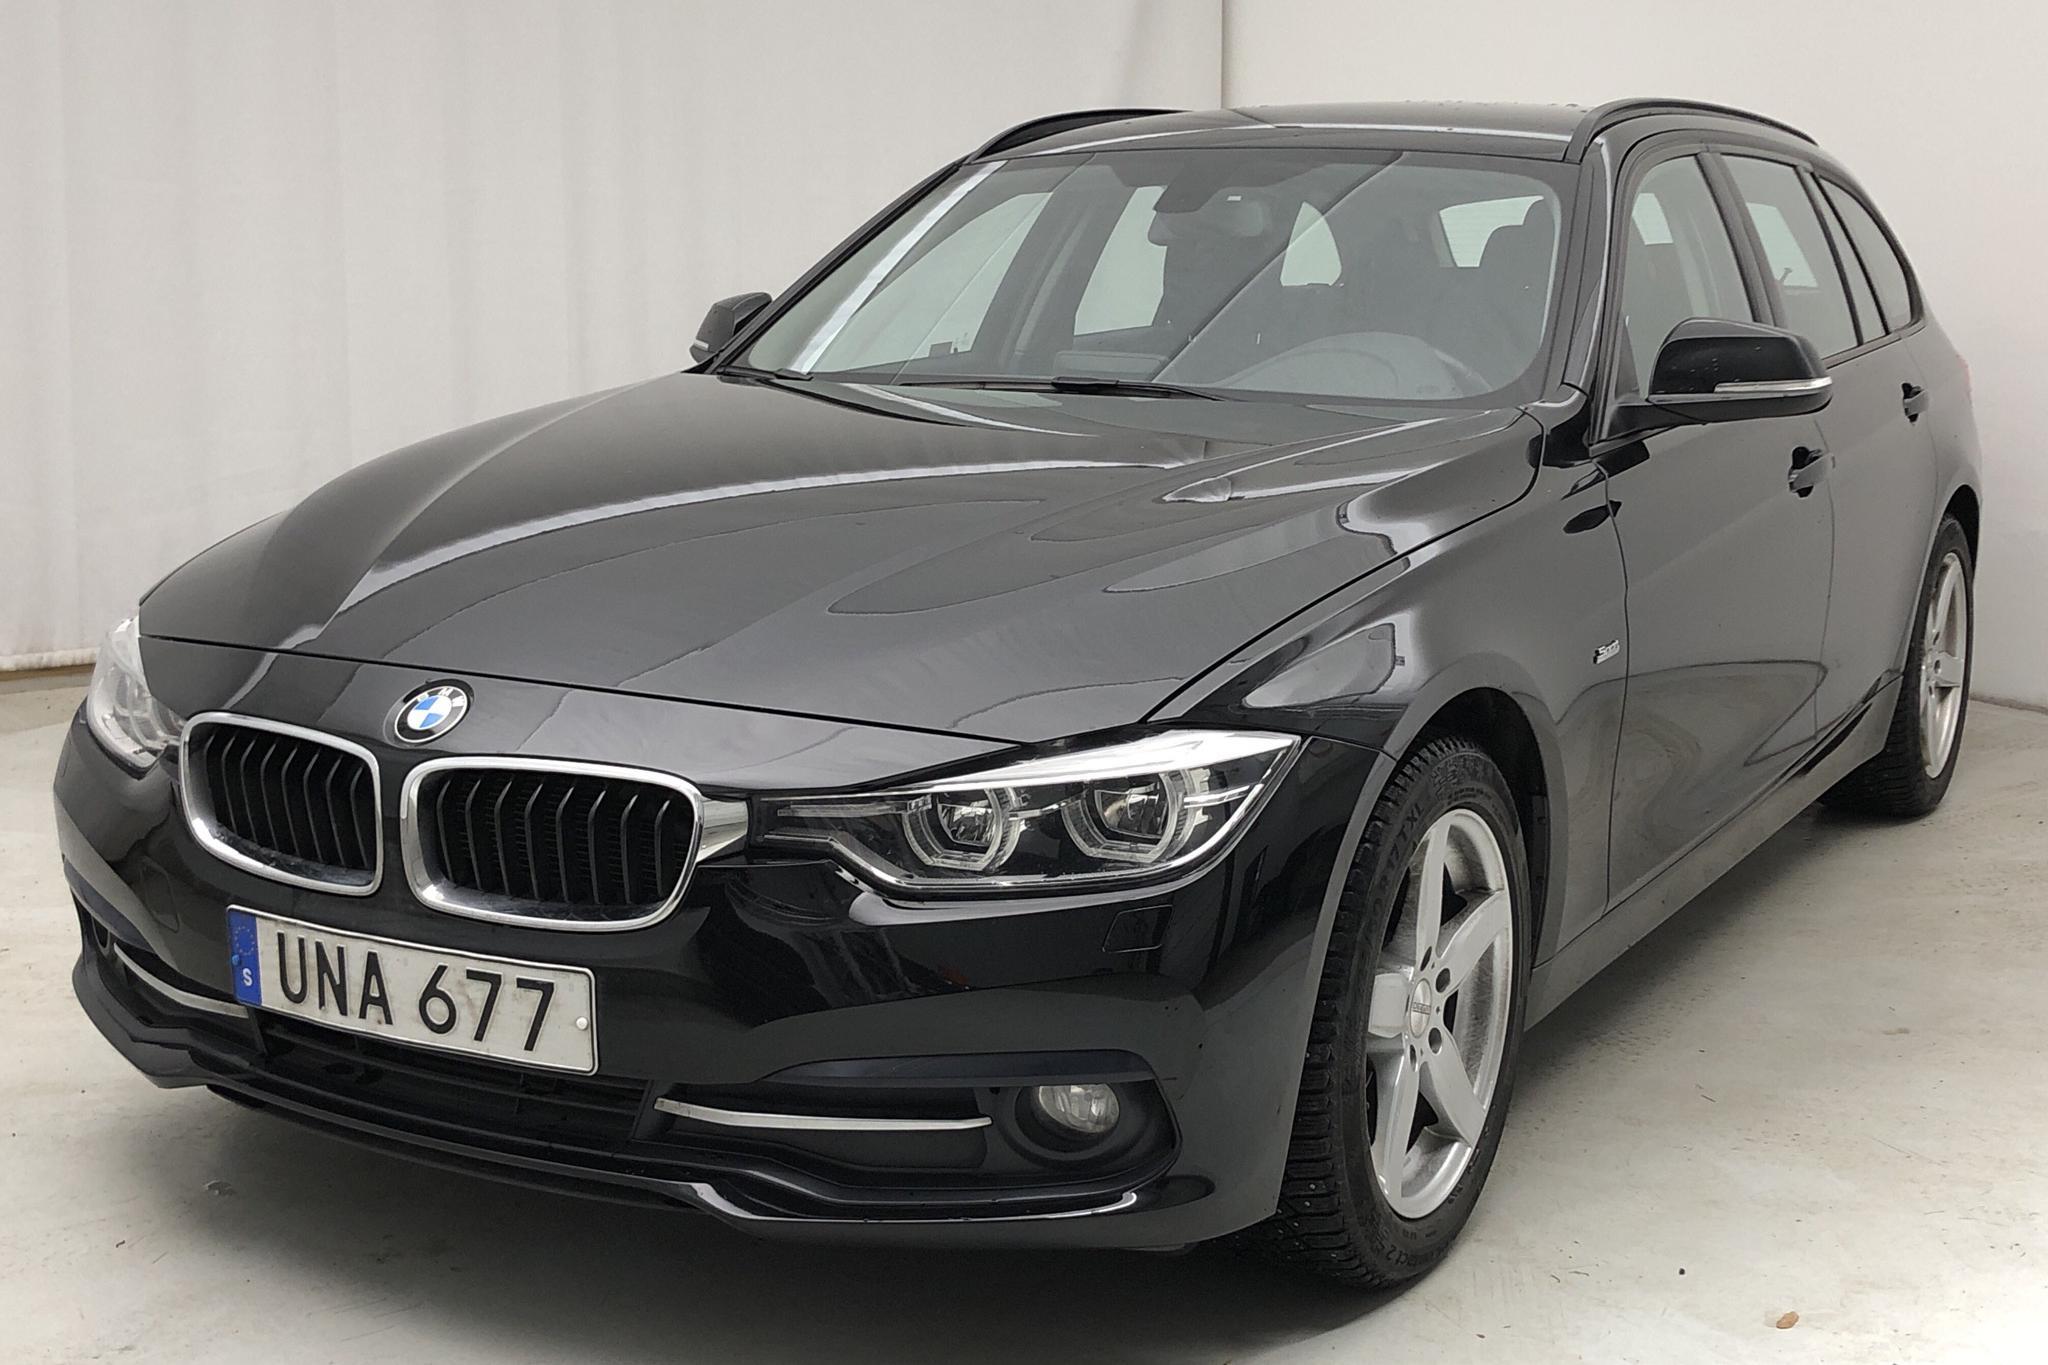 BMW 320d Touring, F31 (190hk) - 105 090 km - Manual - black - 2017